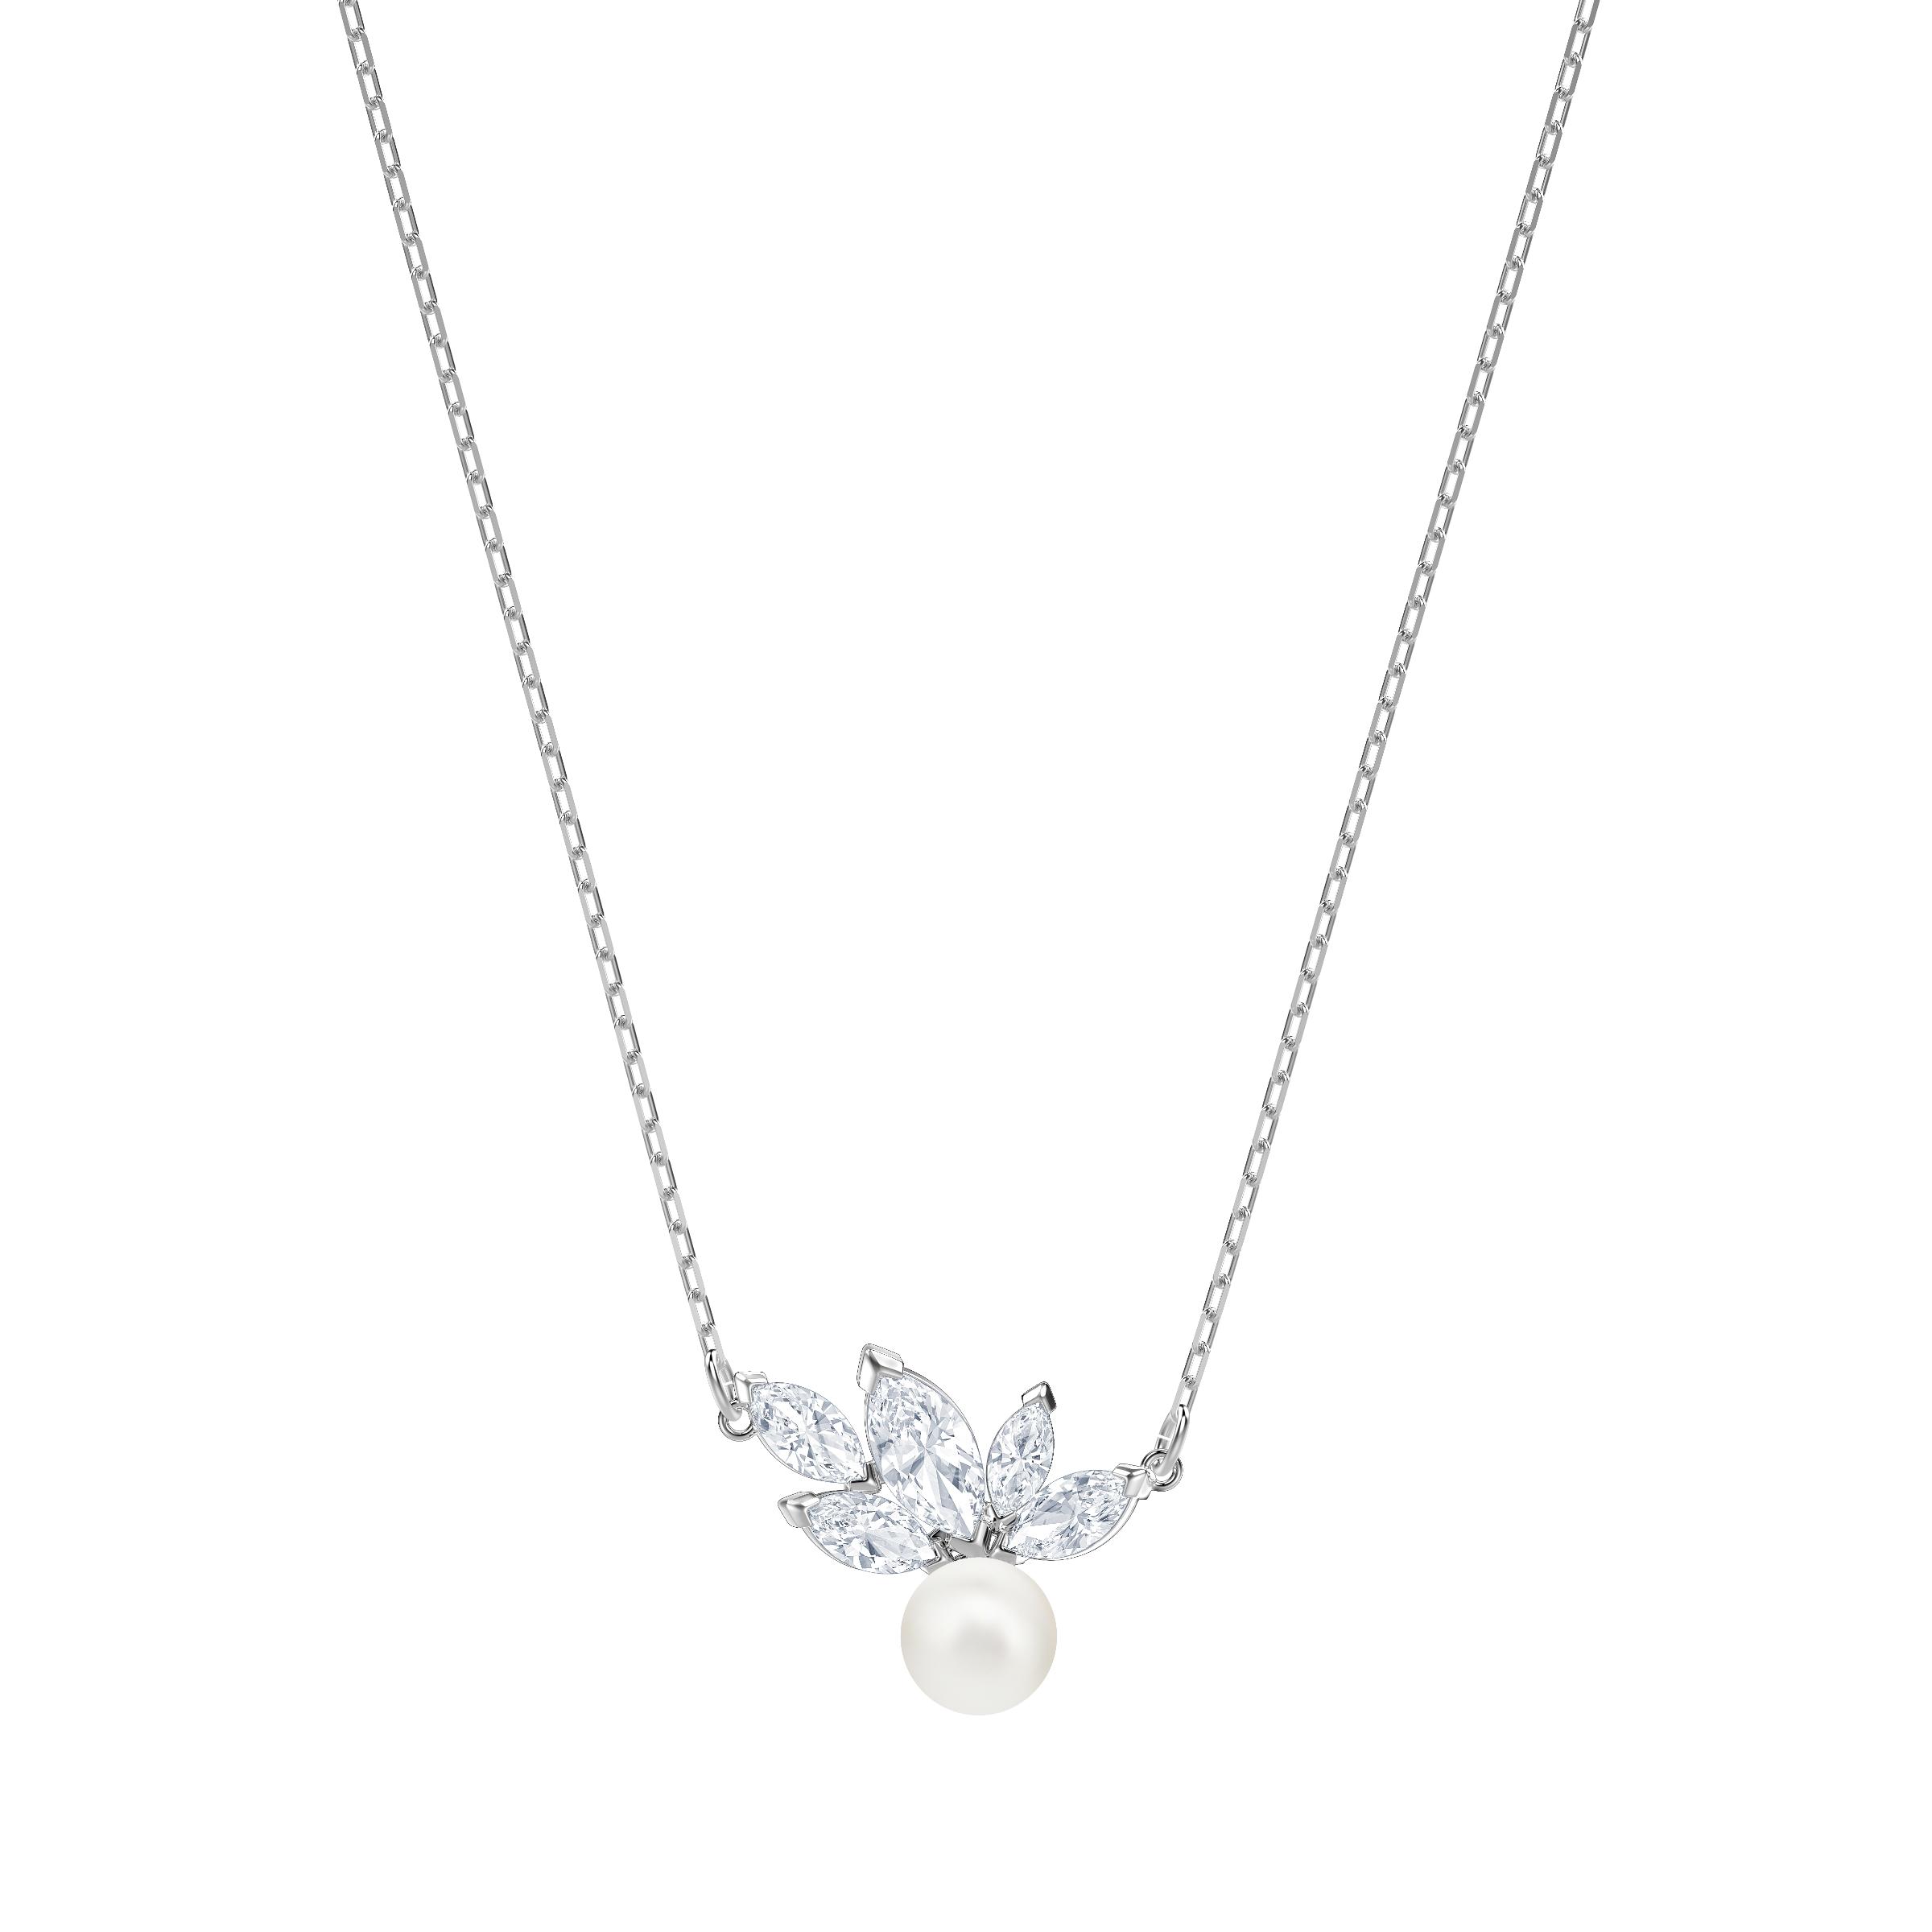 Louison Pearl Pendant, White, Rhodium Plating